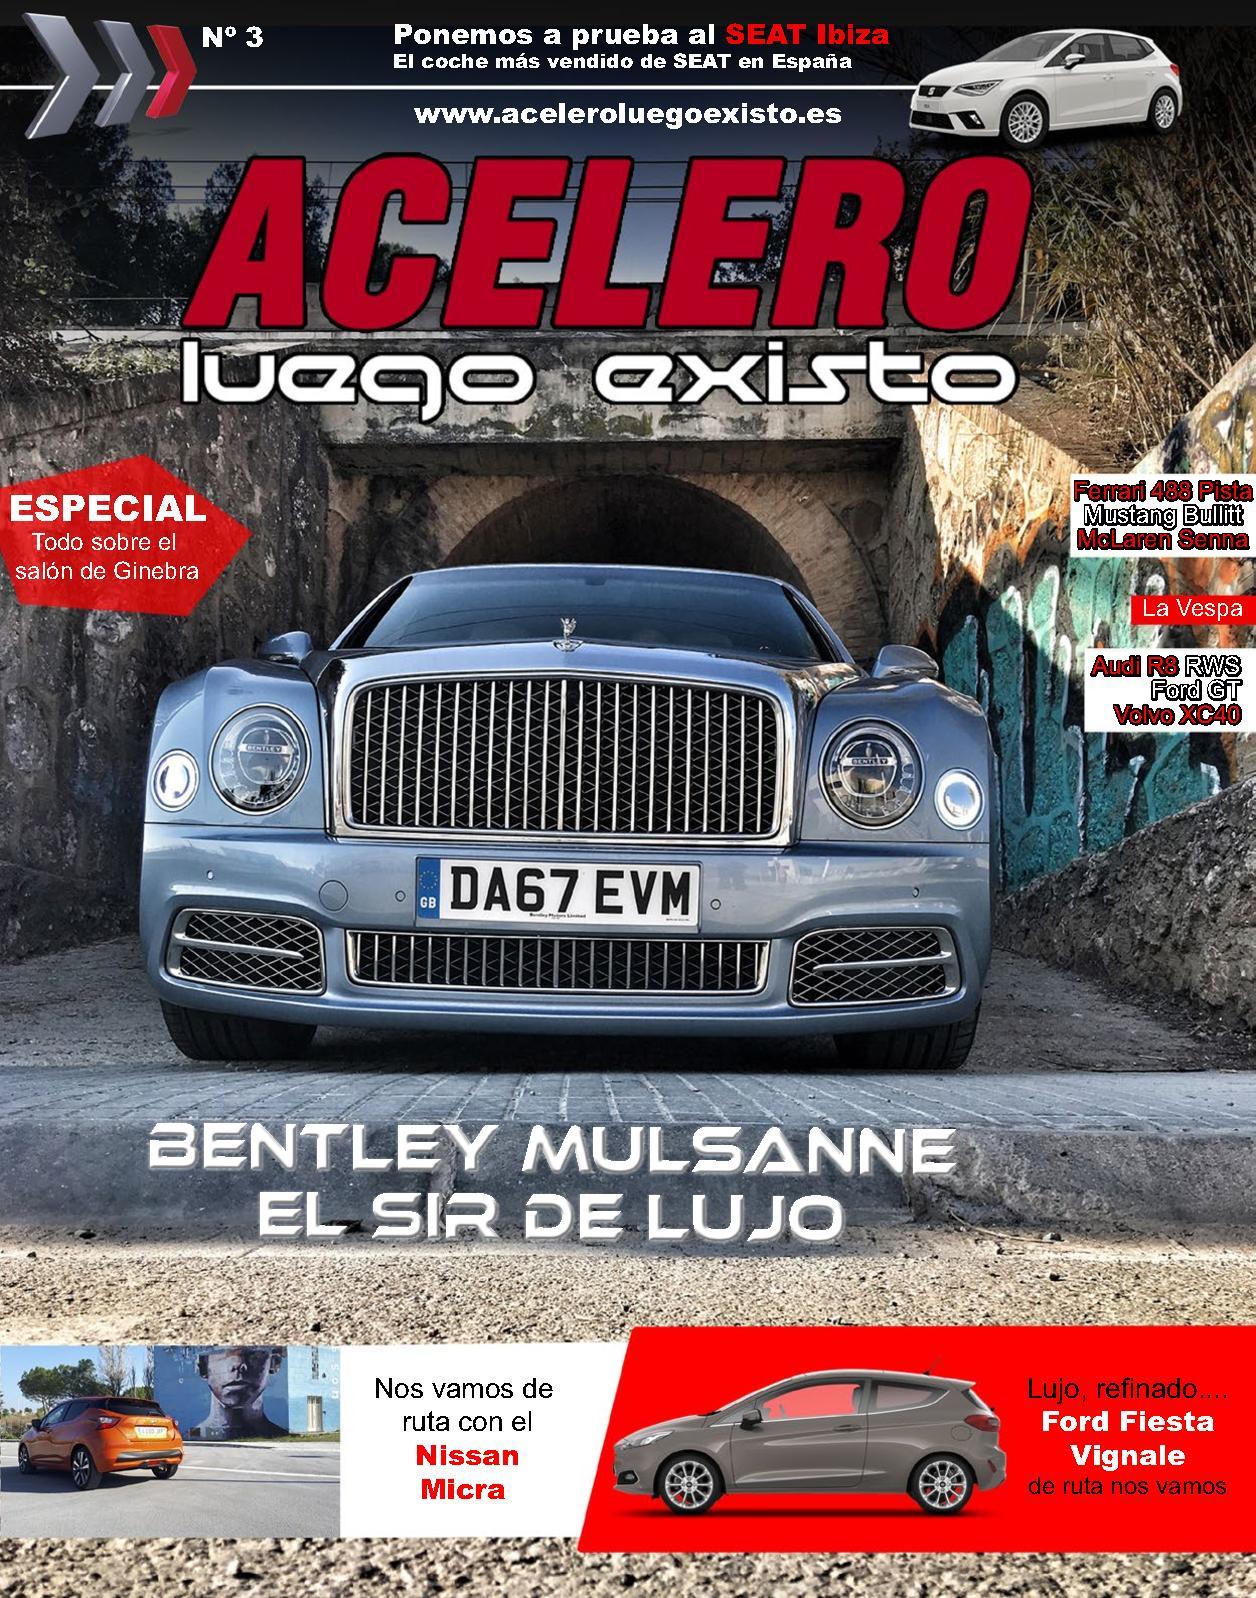 Jaguar E-type 2+2 Serie II Coupe Delantero 3 Punto Inercia Kit Cinturón De Seguridad Automático